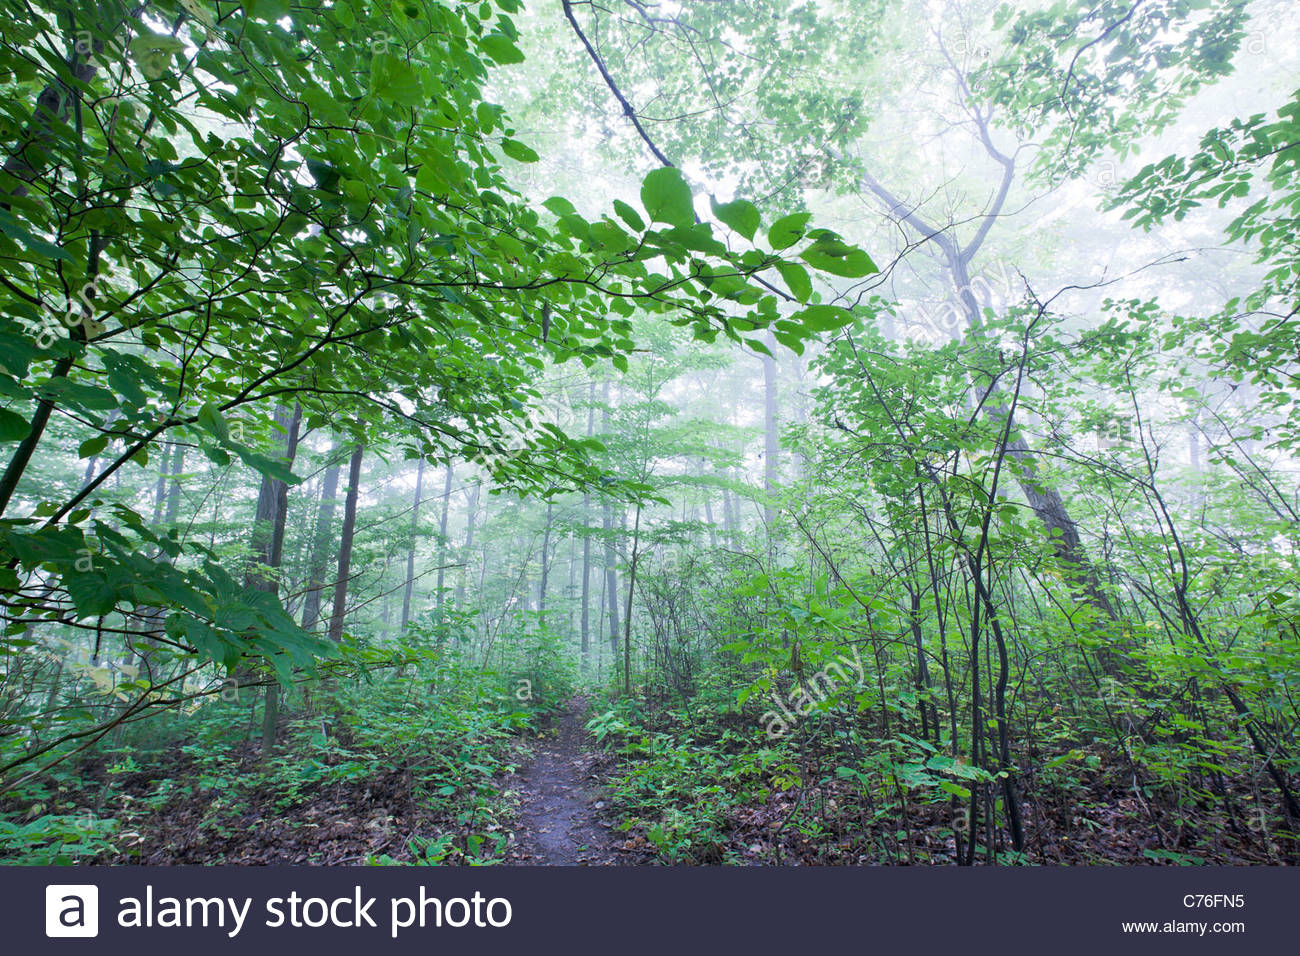 a-foggy-day-in-late-summer-in-the-caroli